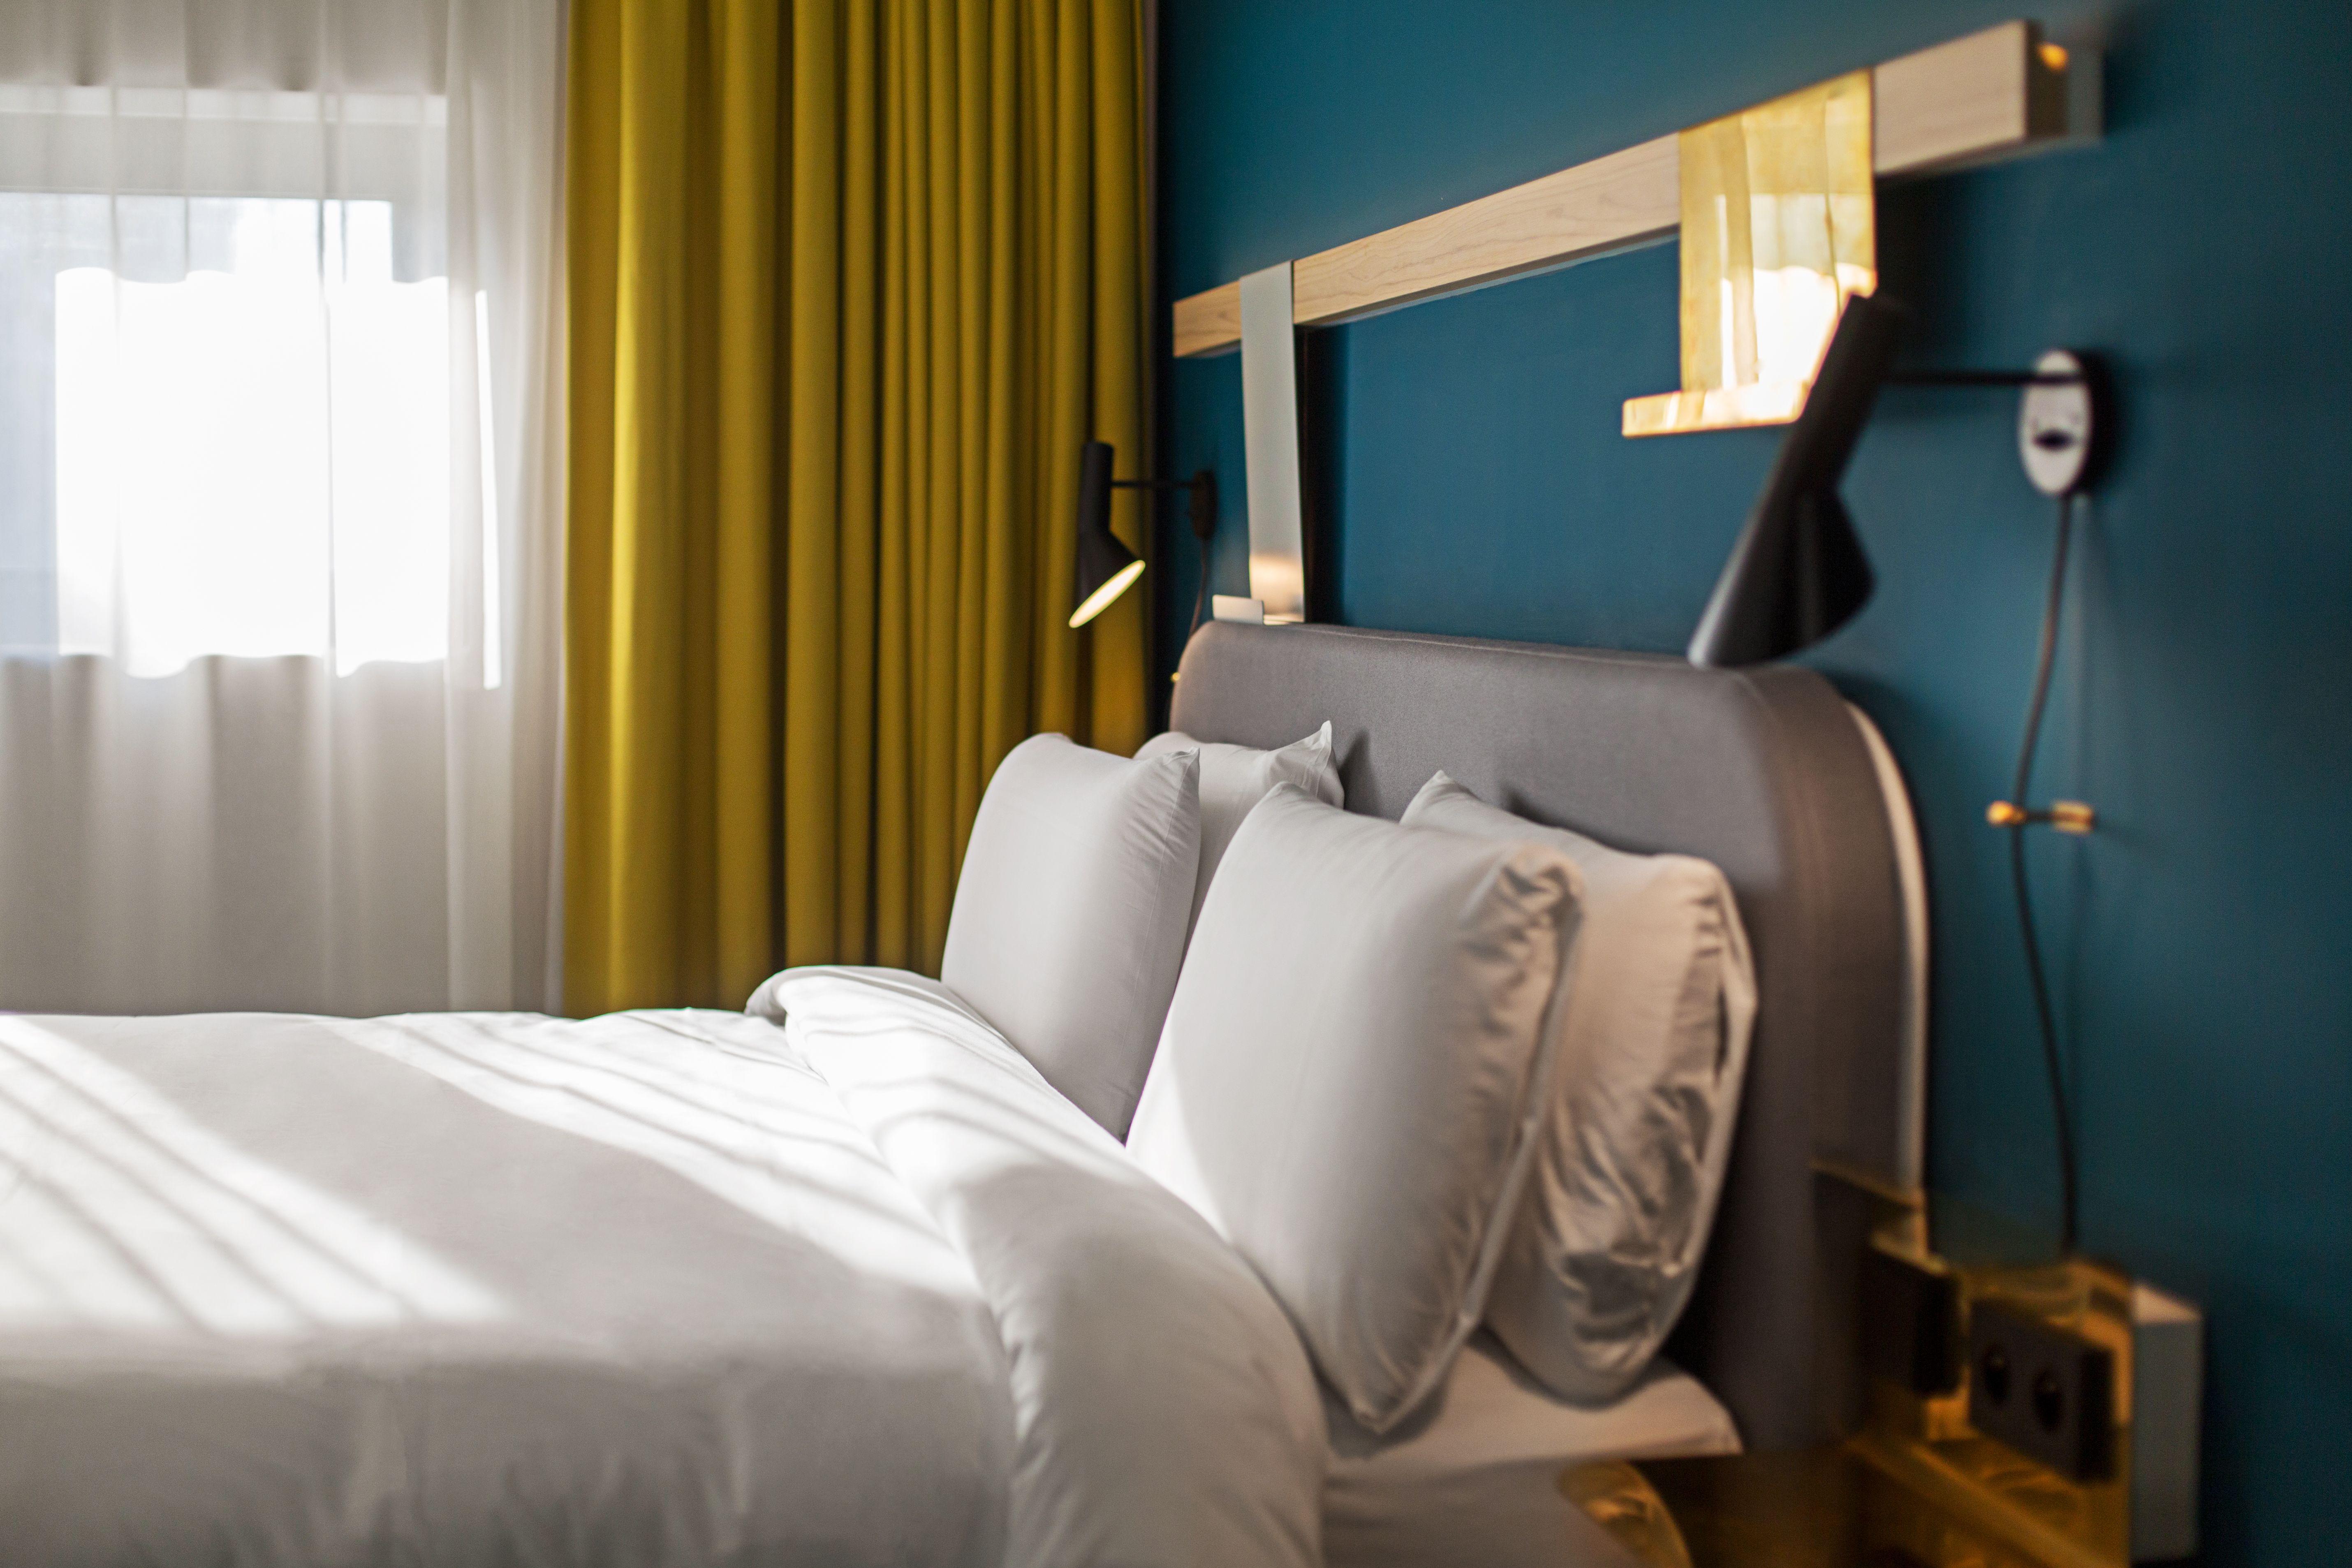 Hotel Mercure Hotel By Naco Nantes France Avec Images Mercure Gare